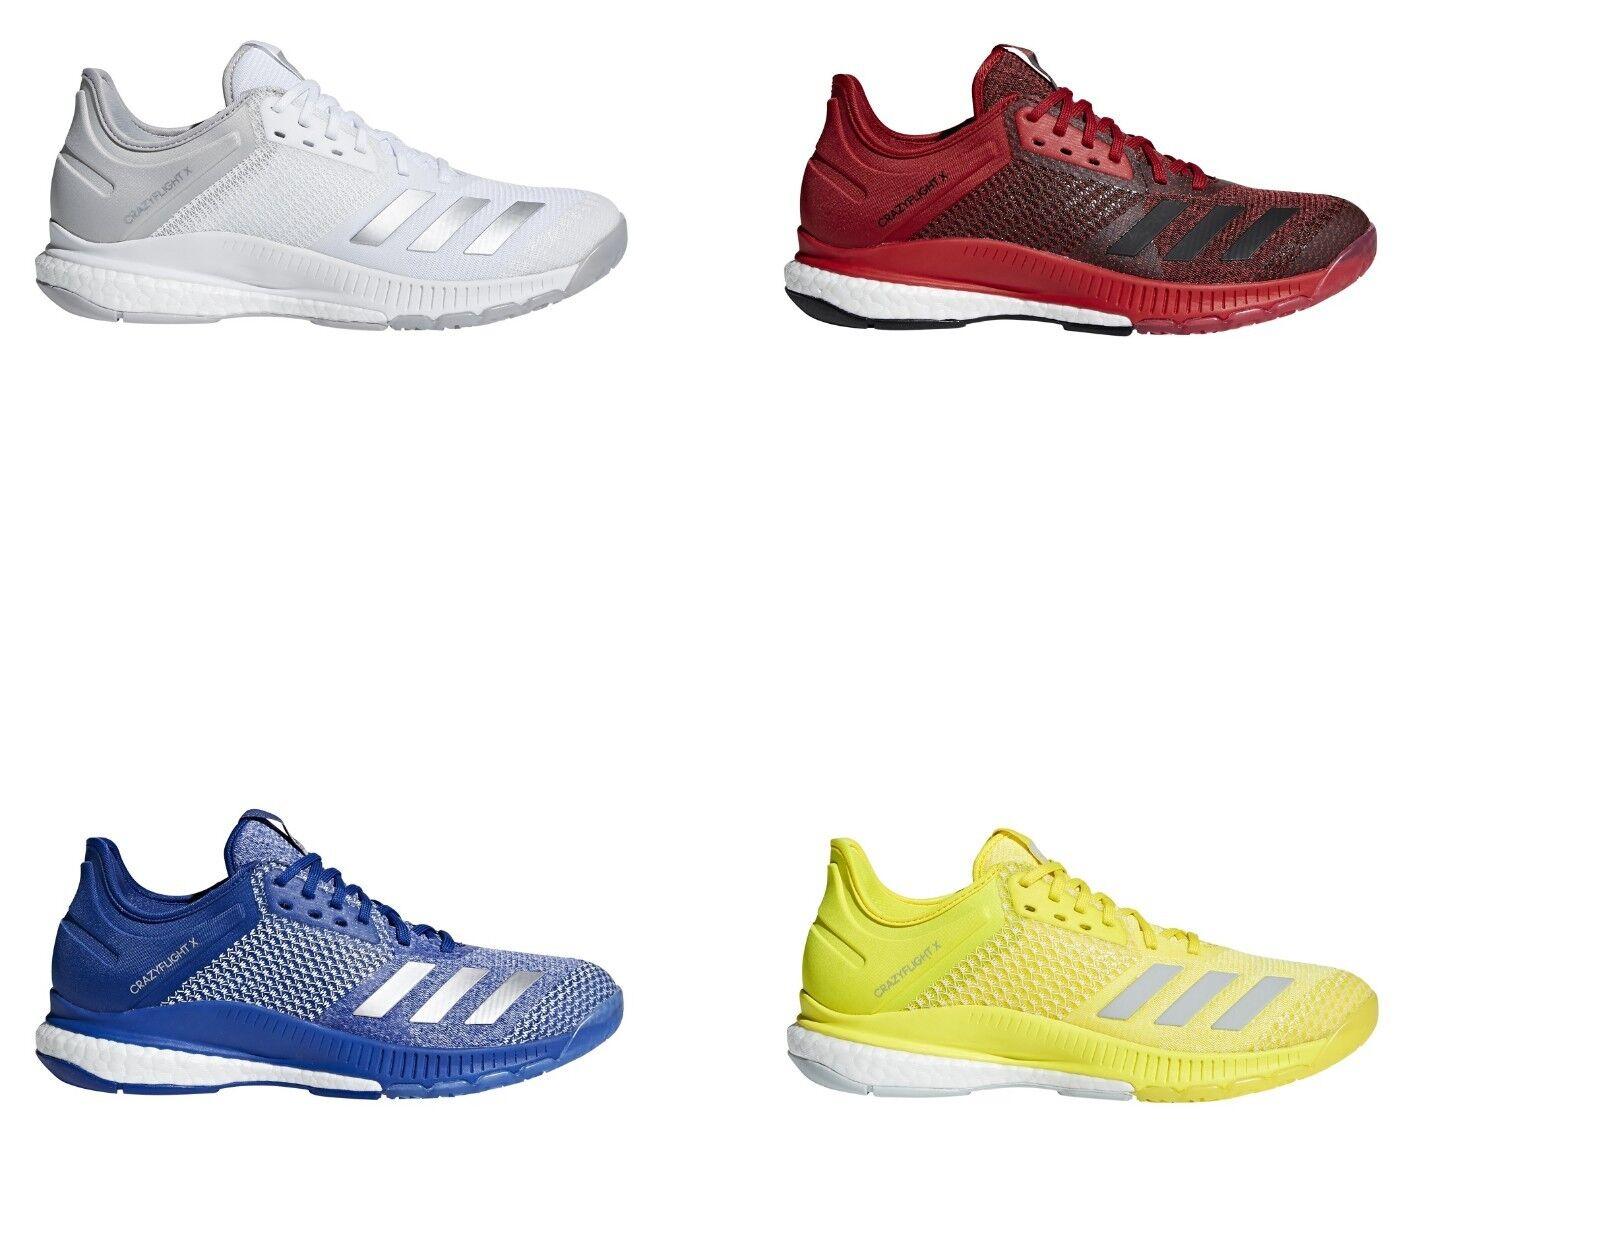 Crazyflight Shoes Adidas Volleyball X Men's1 Women's 2 Boost Smaller Size tQrdxhsC